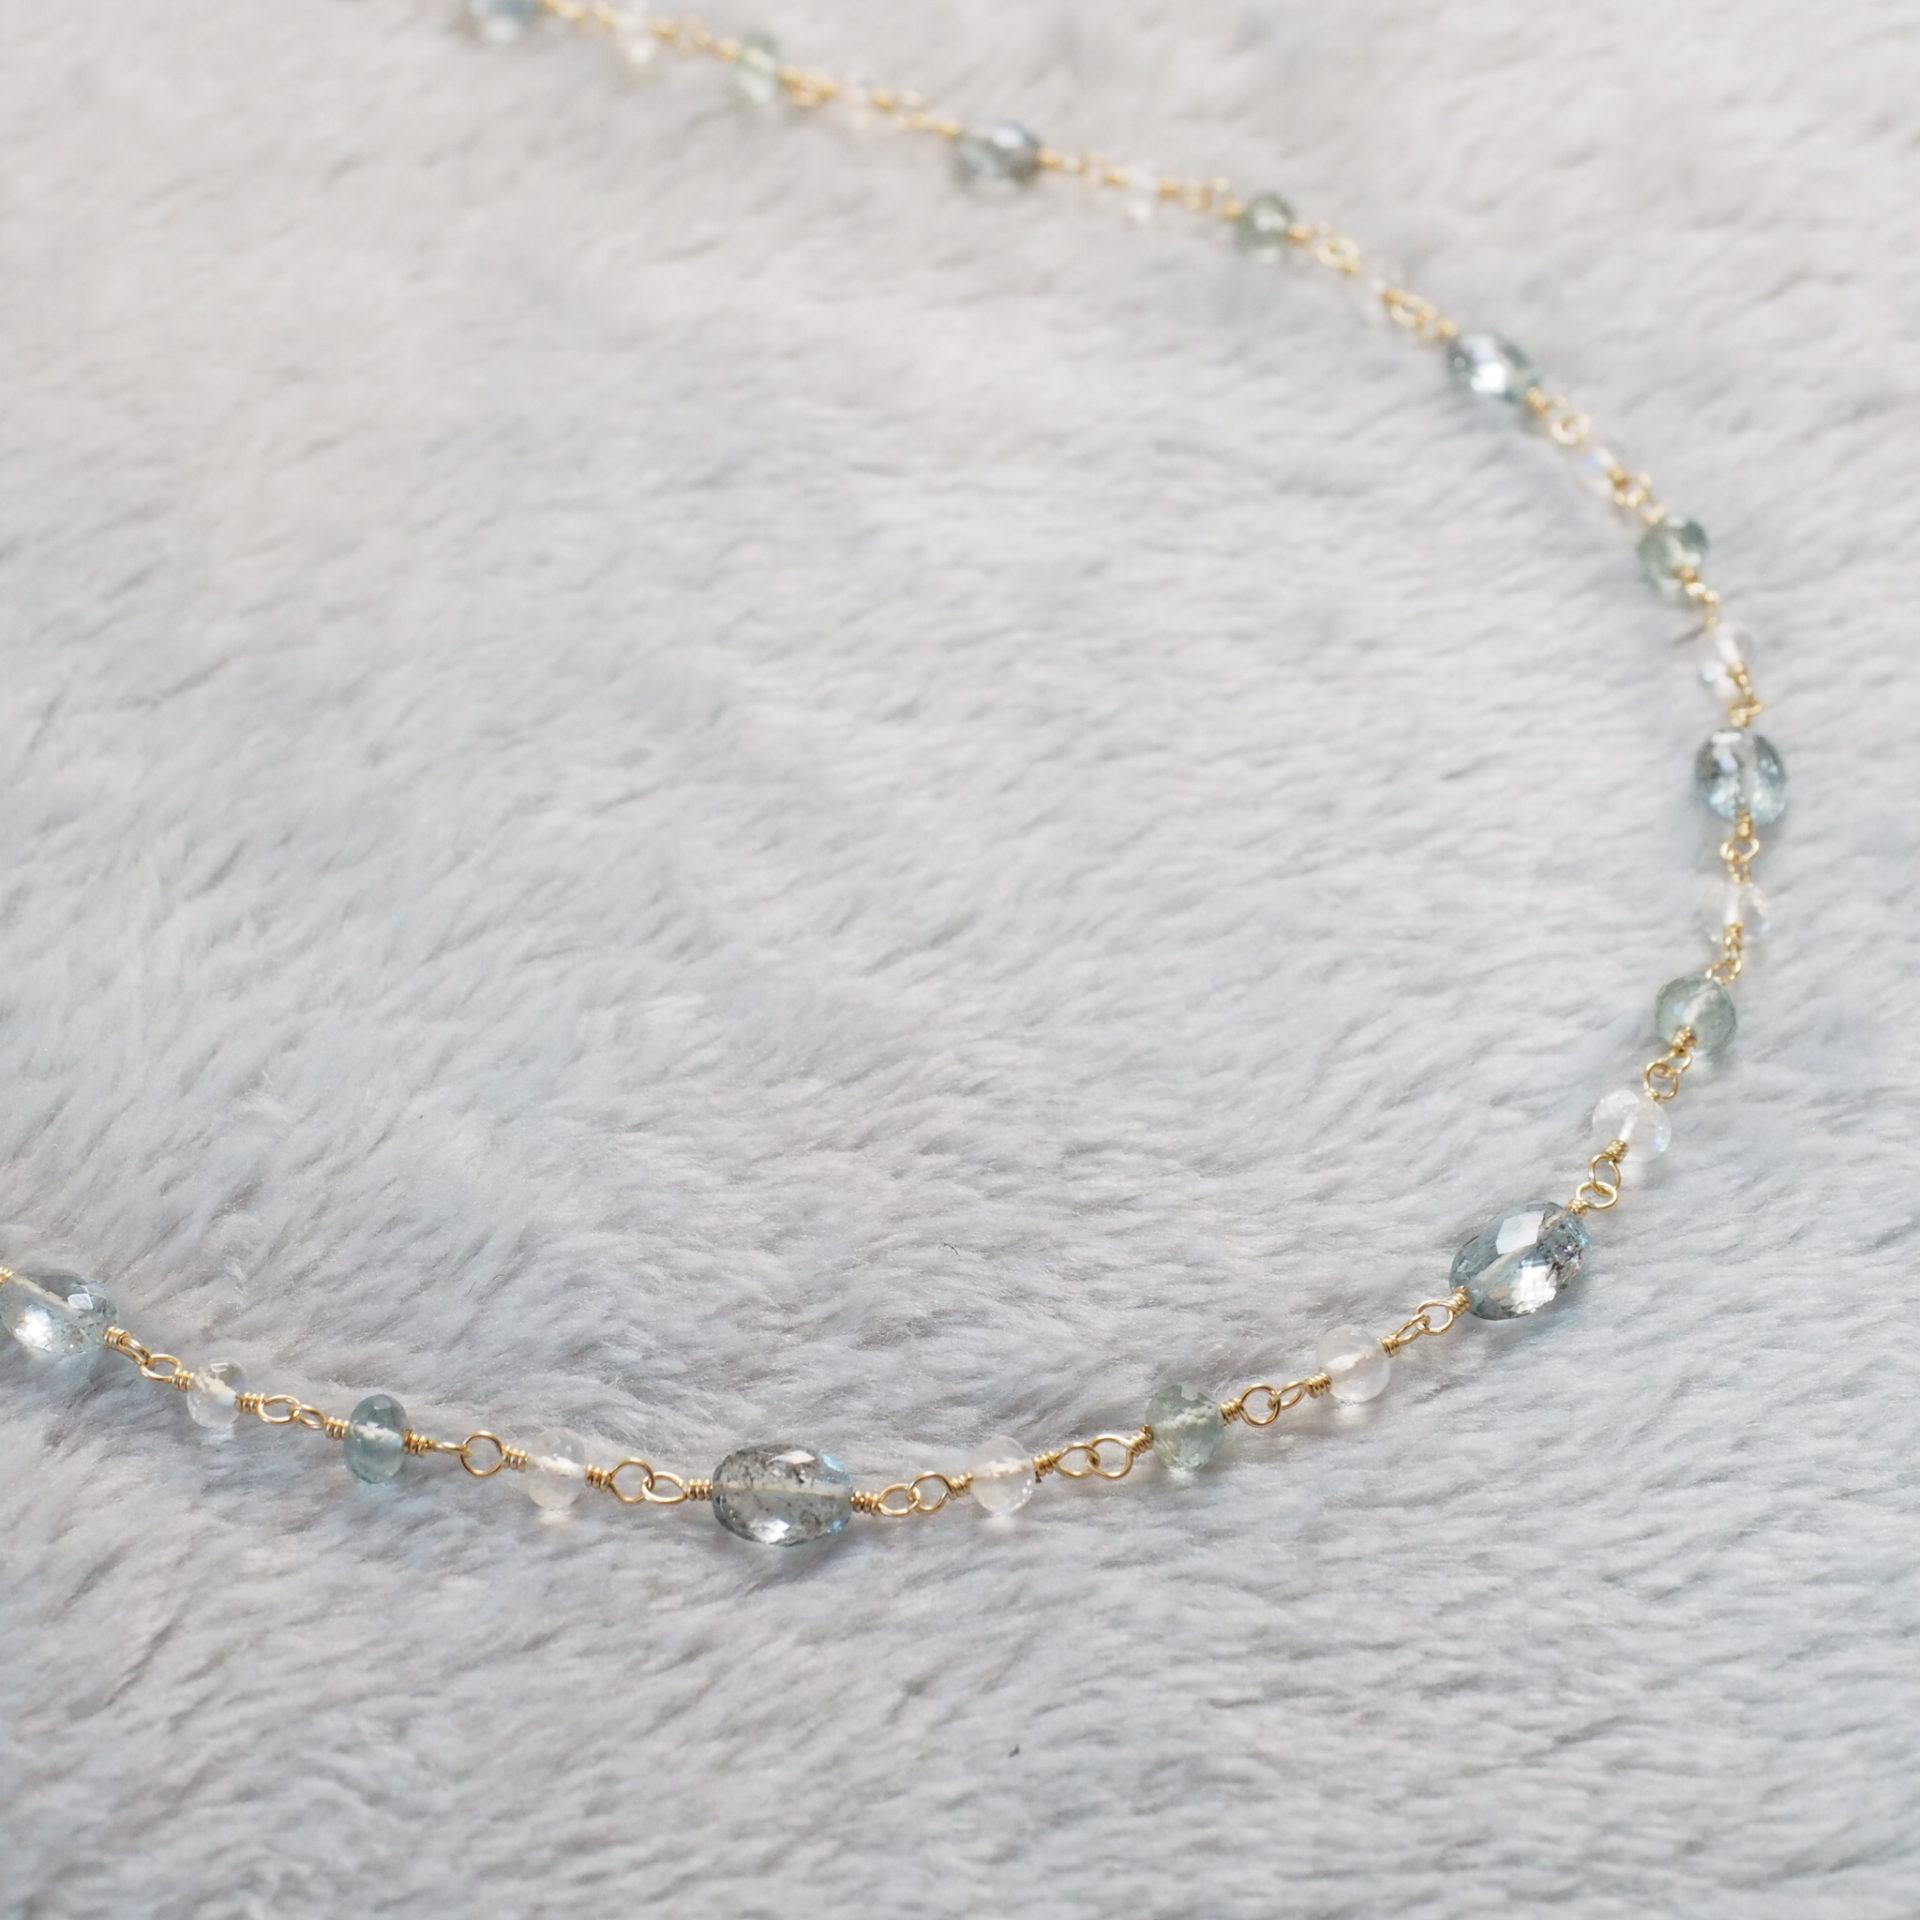 Moss-Aquamarine-White-Labradorite-Necklace